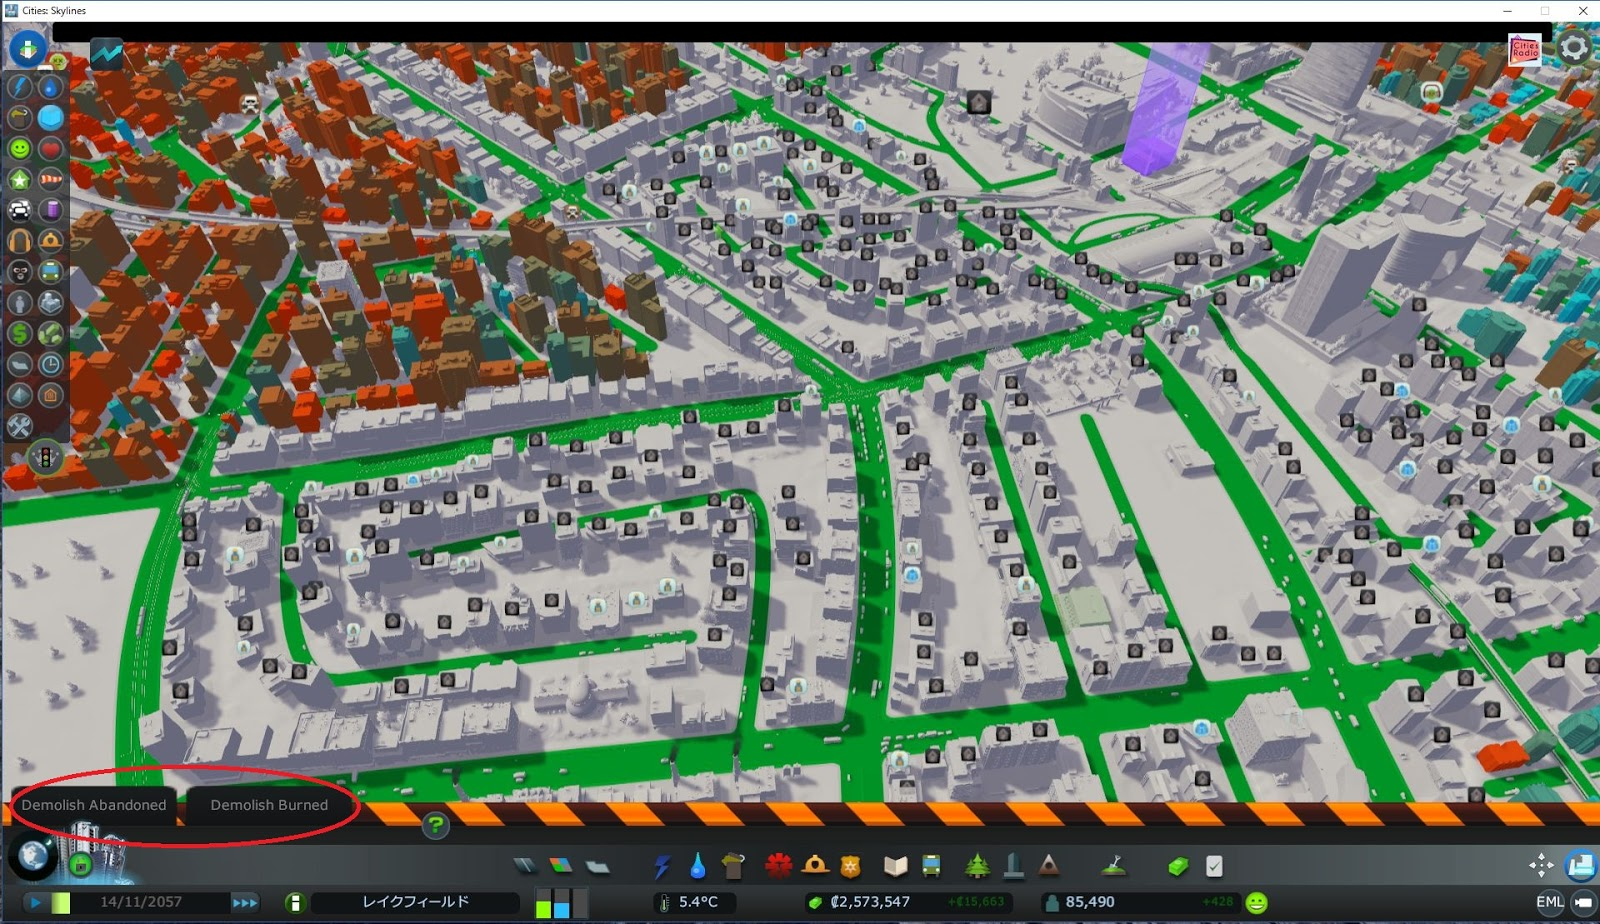 Cities Skylines Mod導入ガイド 廃墟を自動的に破壊するautomatic